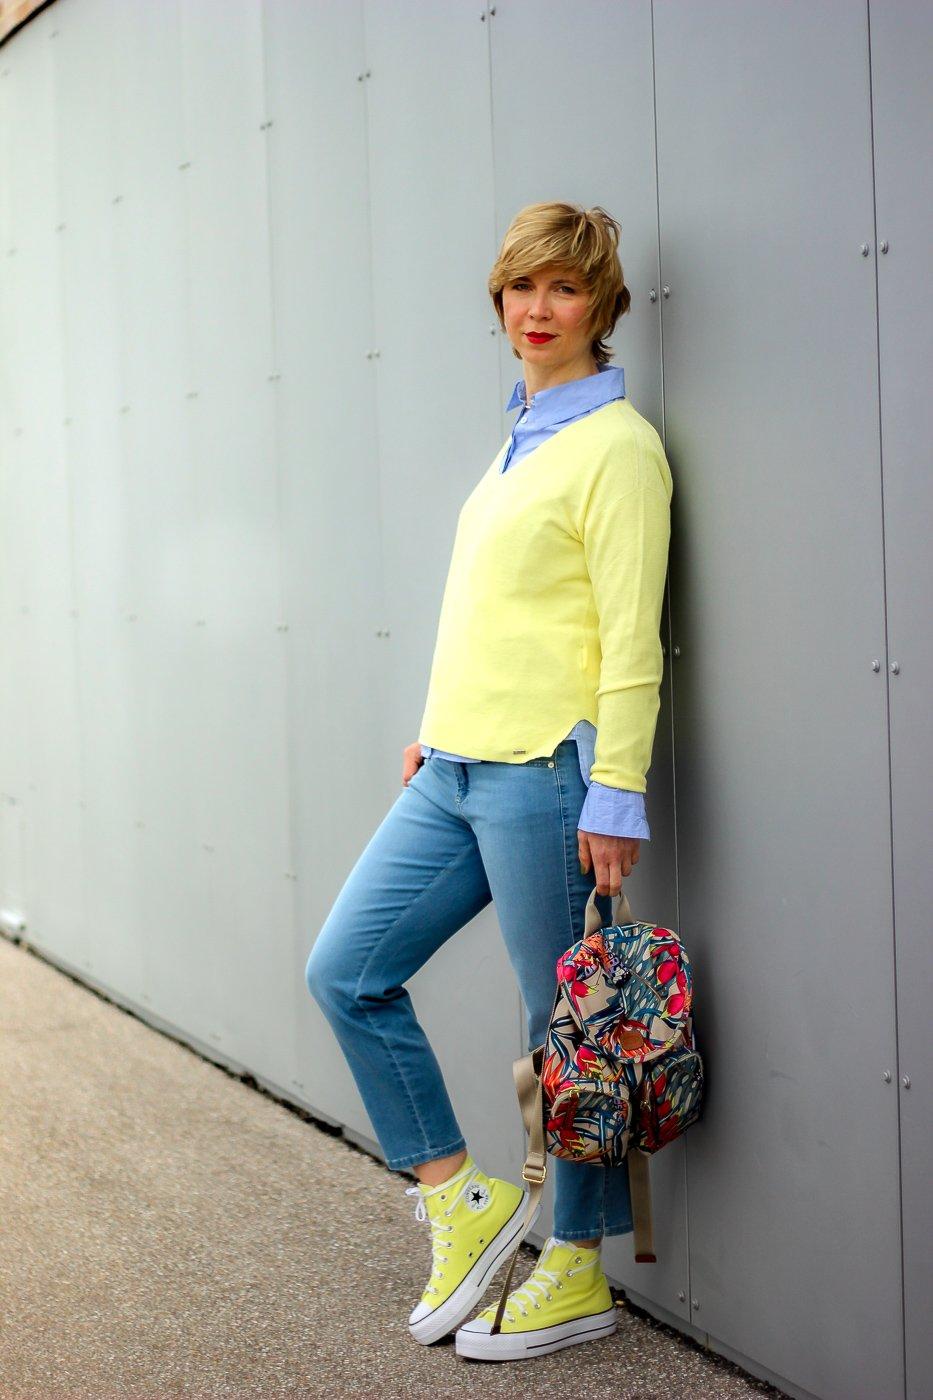 conny doll lifestyle: Toni-Fashion, Frühjahrsmode, gelber Pullover, V-Ausschnitt, Jeans, Bluse mit Streifen, Outfitinspiration